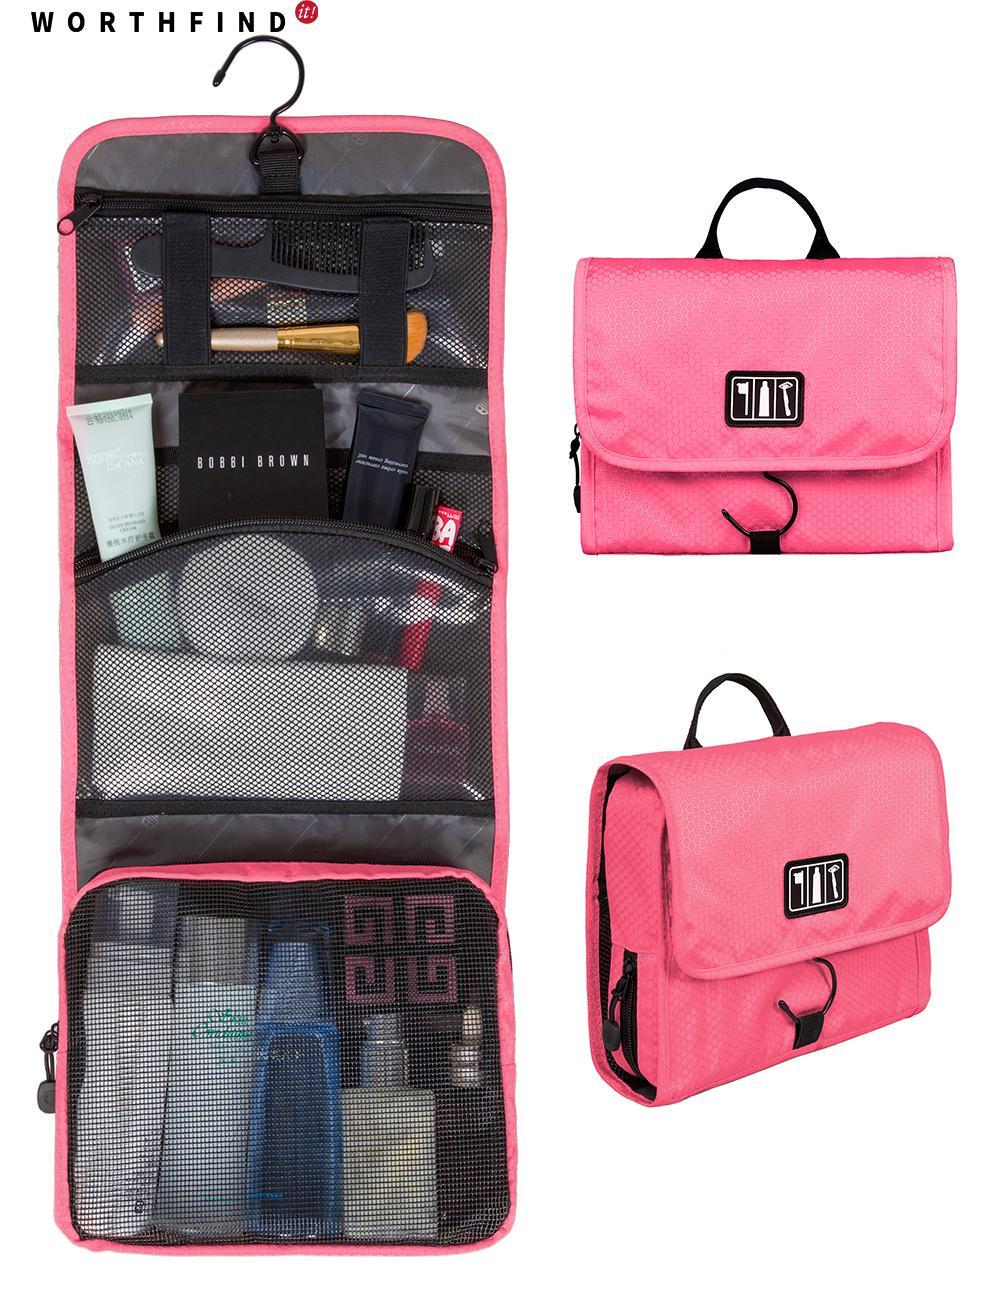 cce8981aa7 2019 WORTHFIND Toiletry Makeup Bag Waterproof Cosmetic Bag Large Women  Travel Storage HandBag Organizer Travel From Faaa